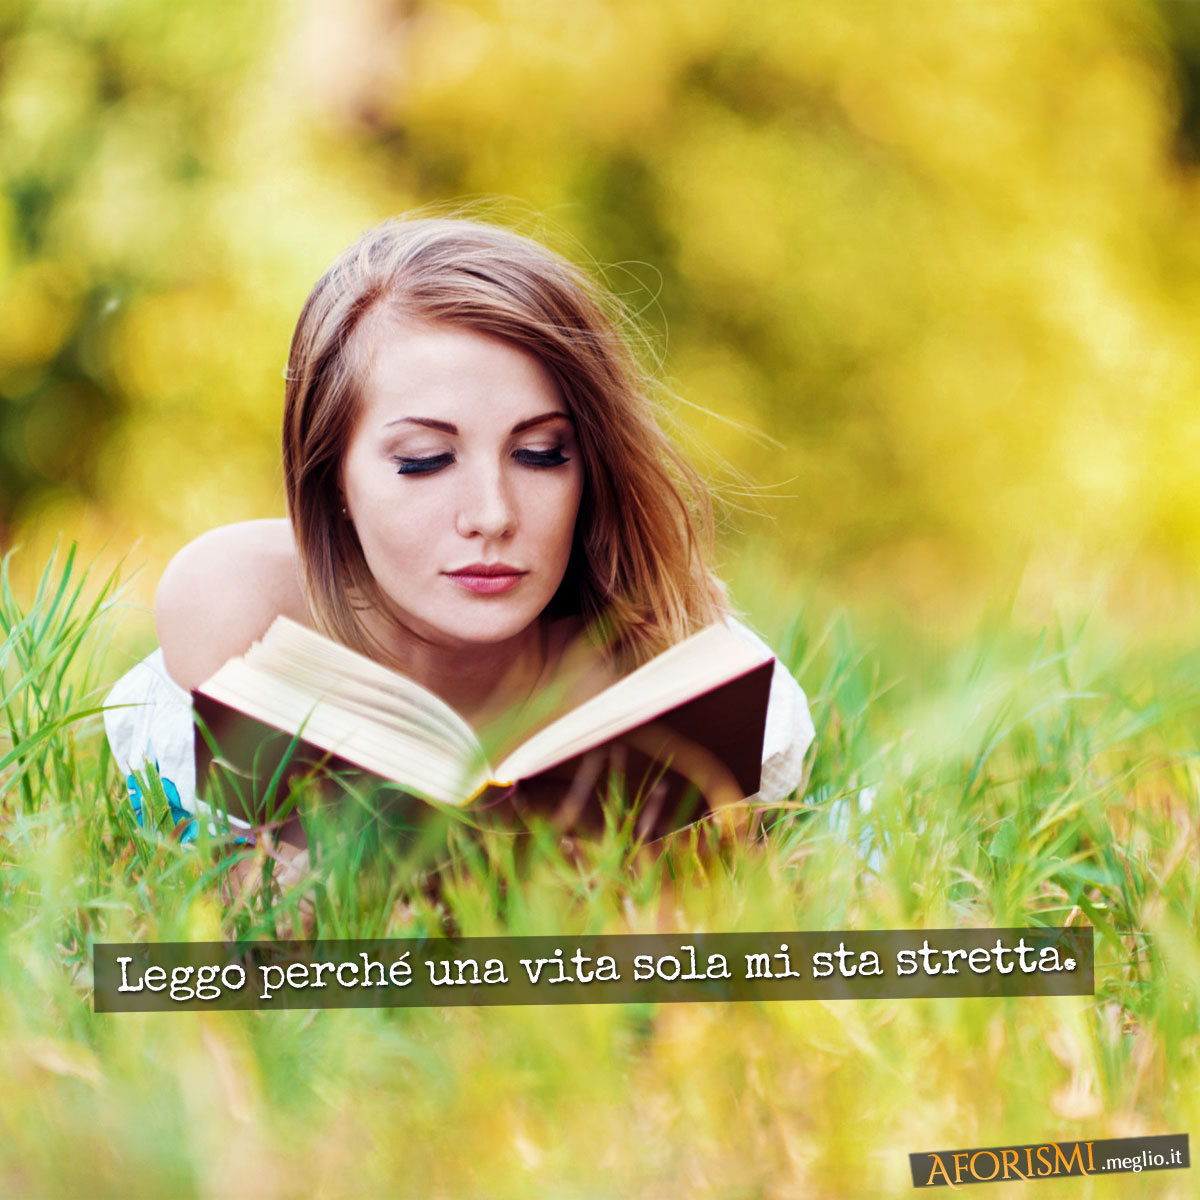 Leggo perché una vita sola mi sta stretta.